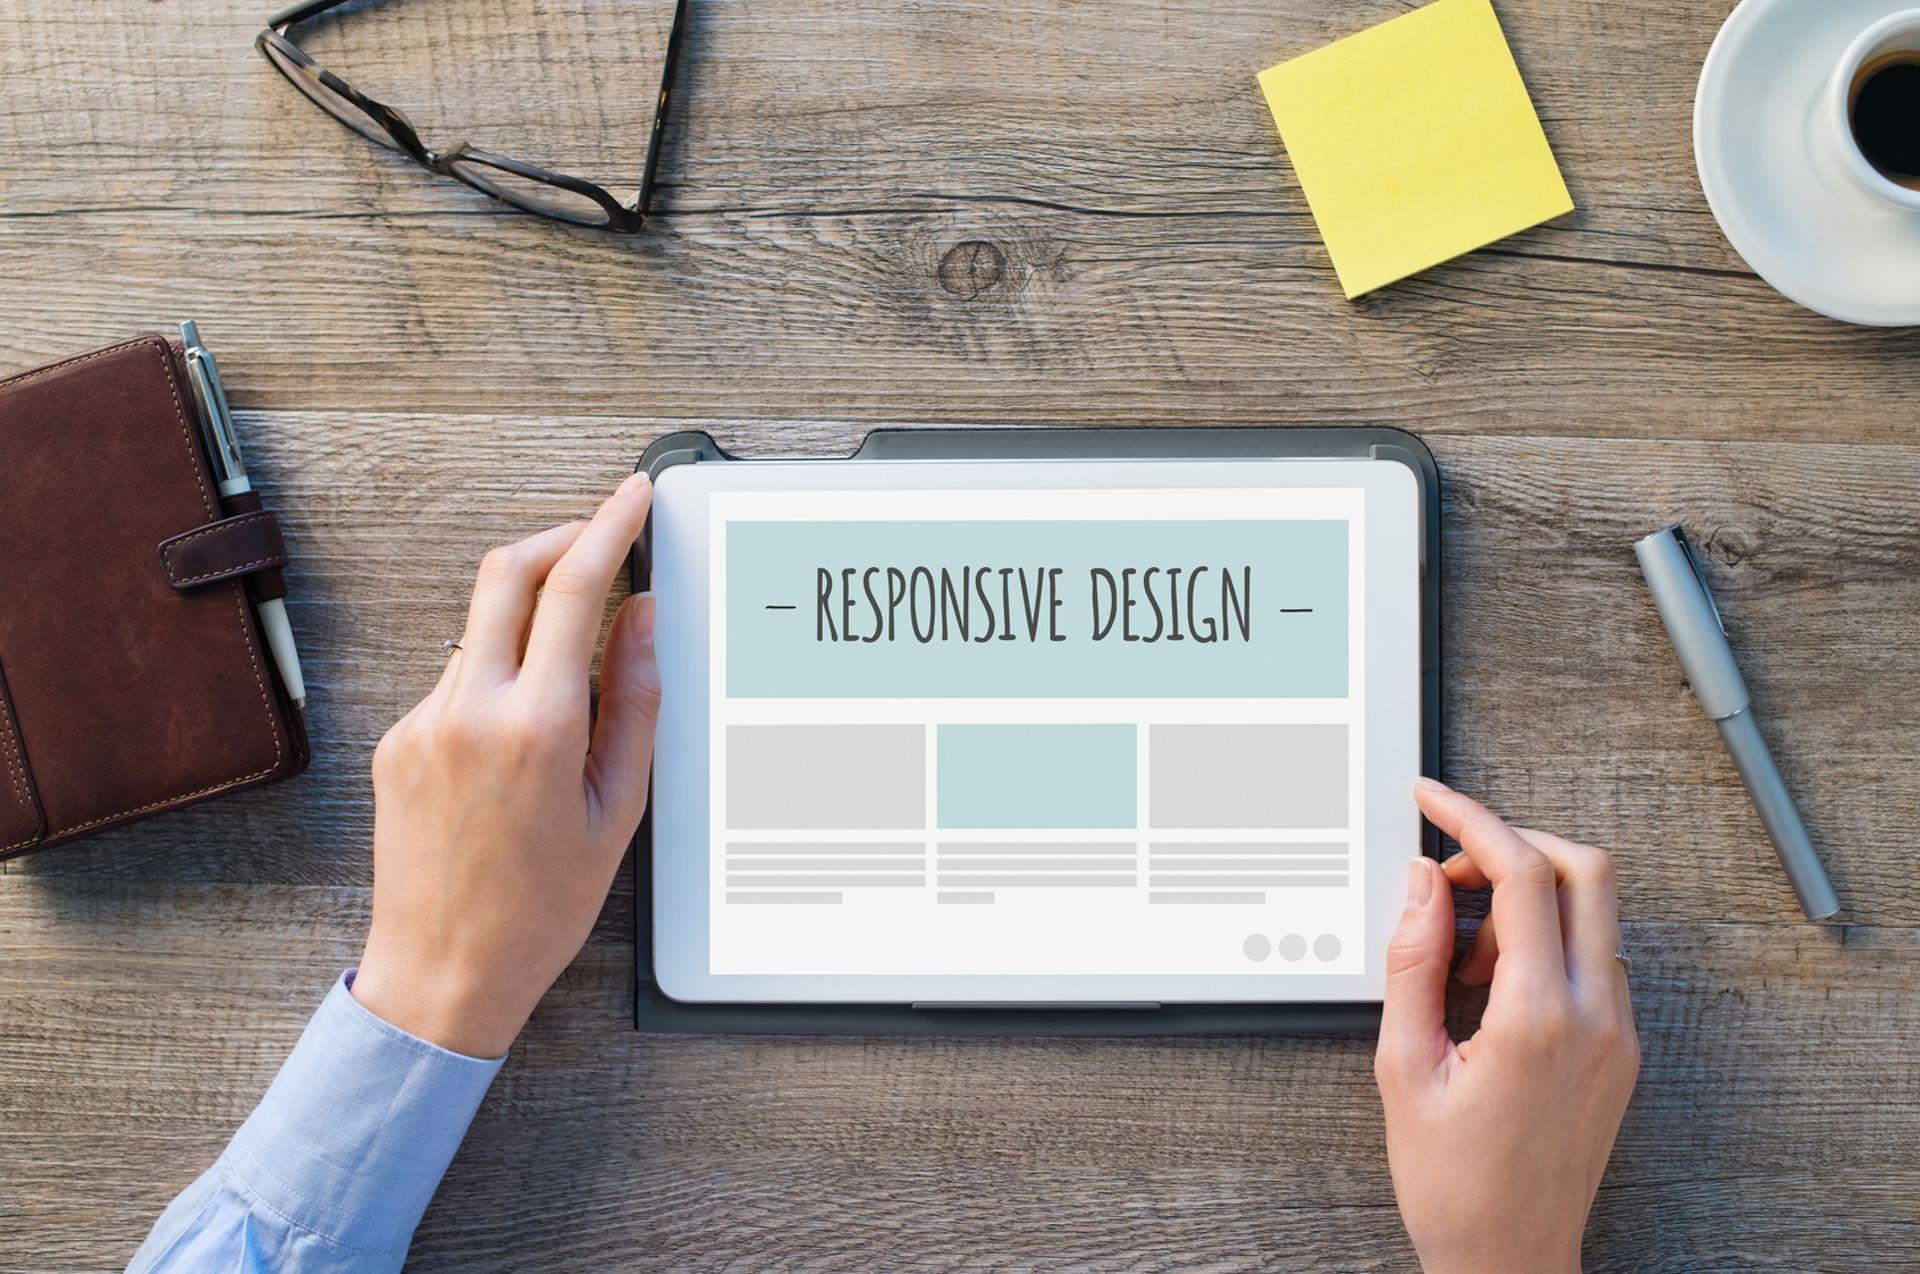 Diseño responsive